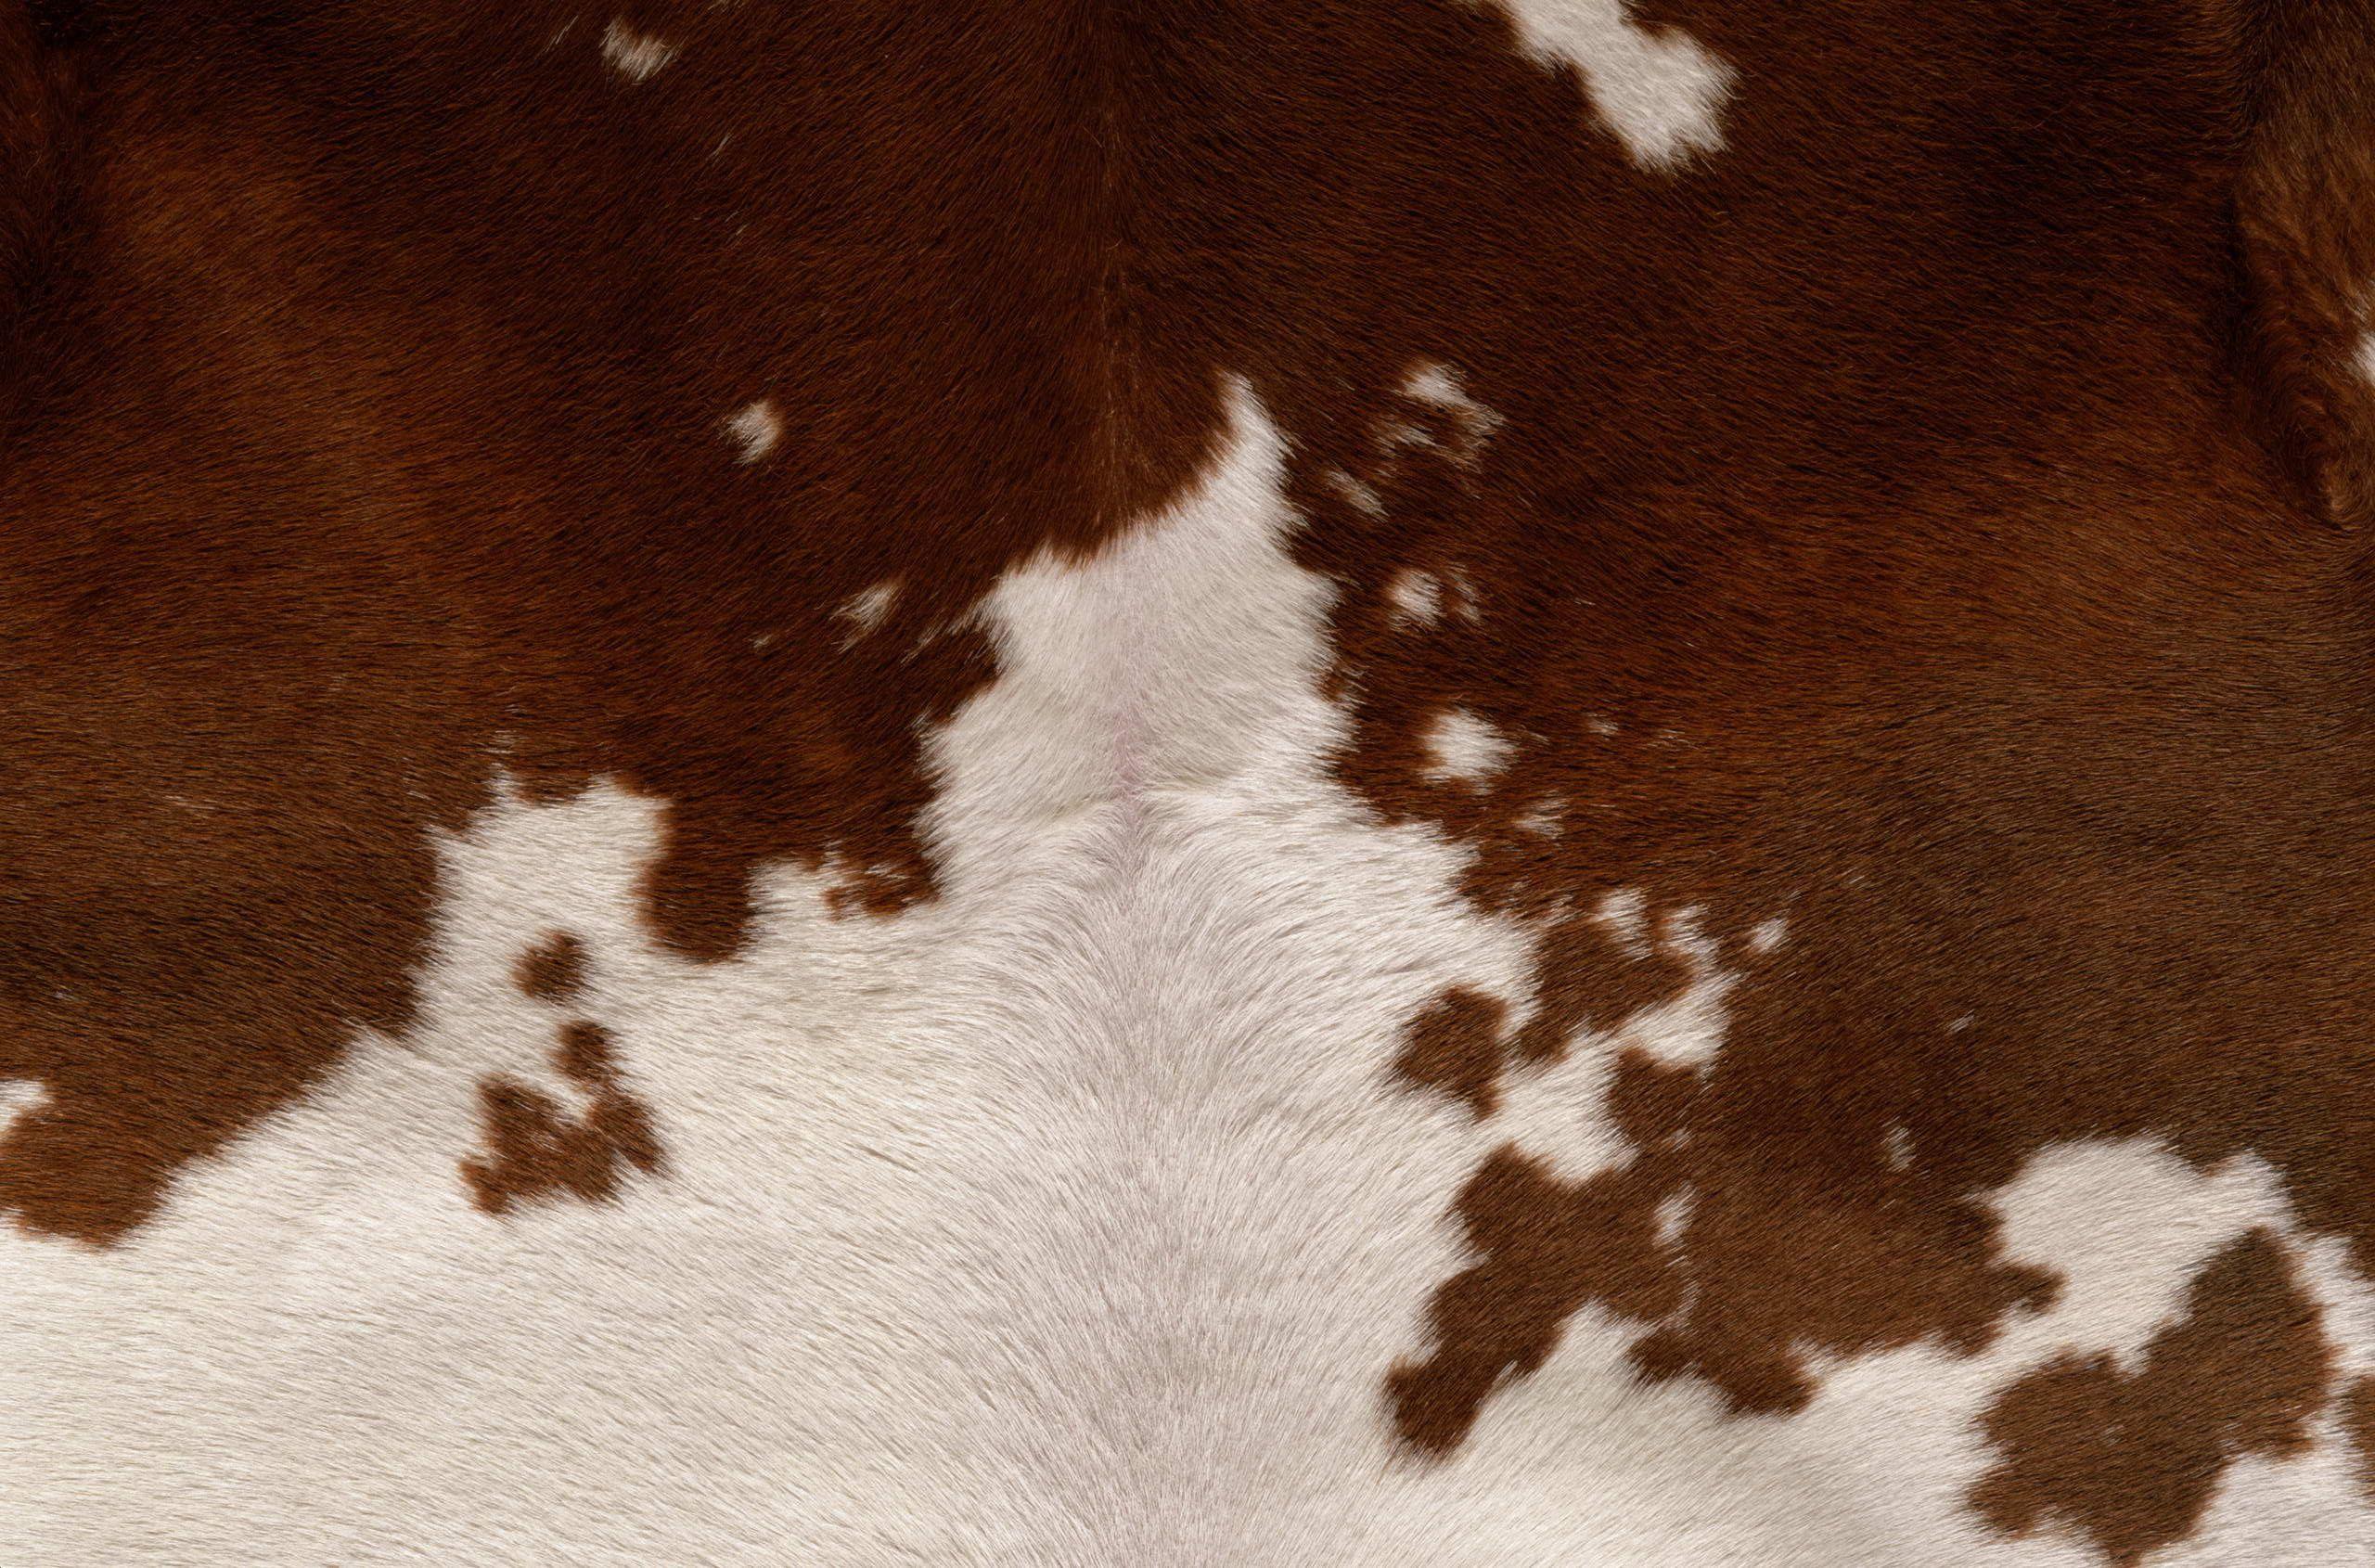 You Cow Metal Art Prints Art Prints Brown Cowhide